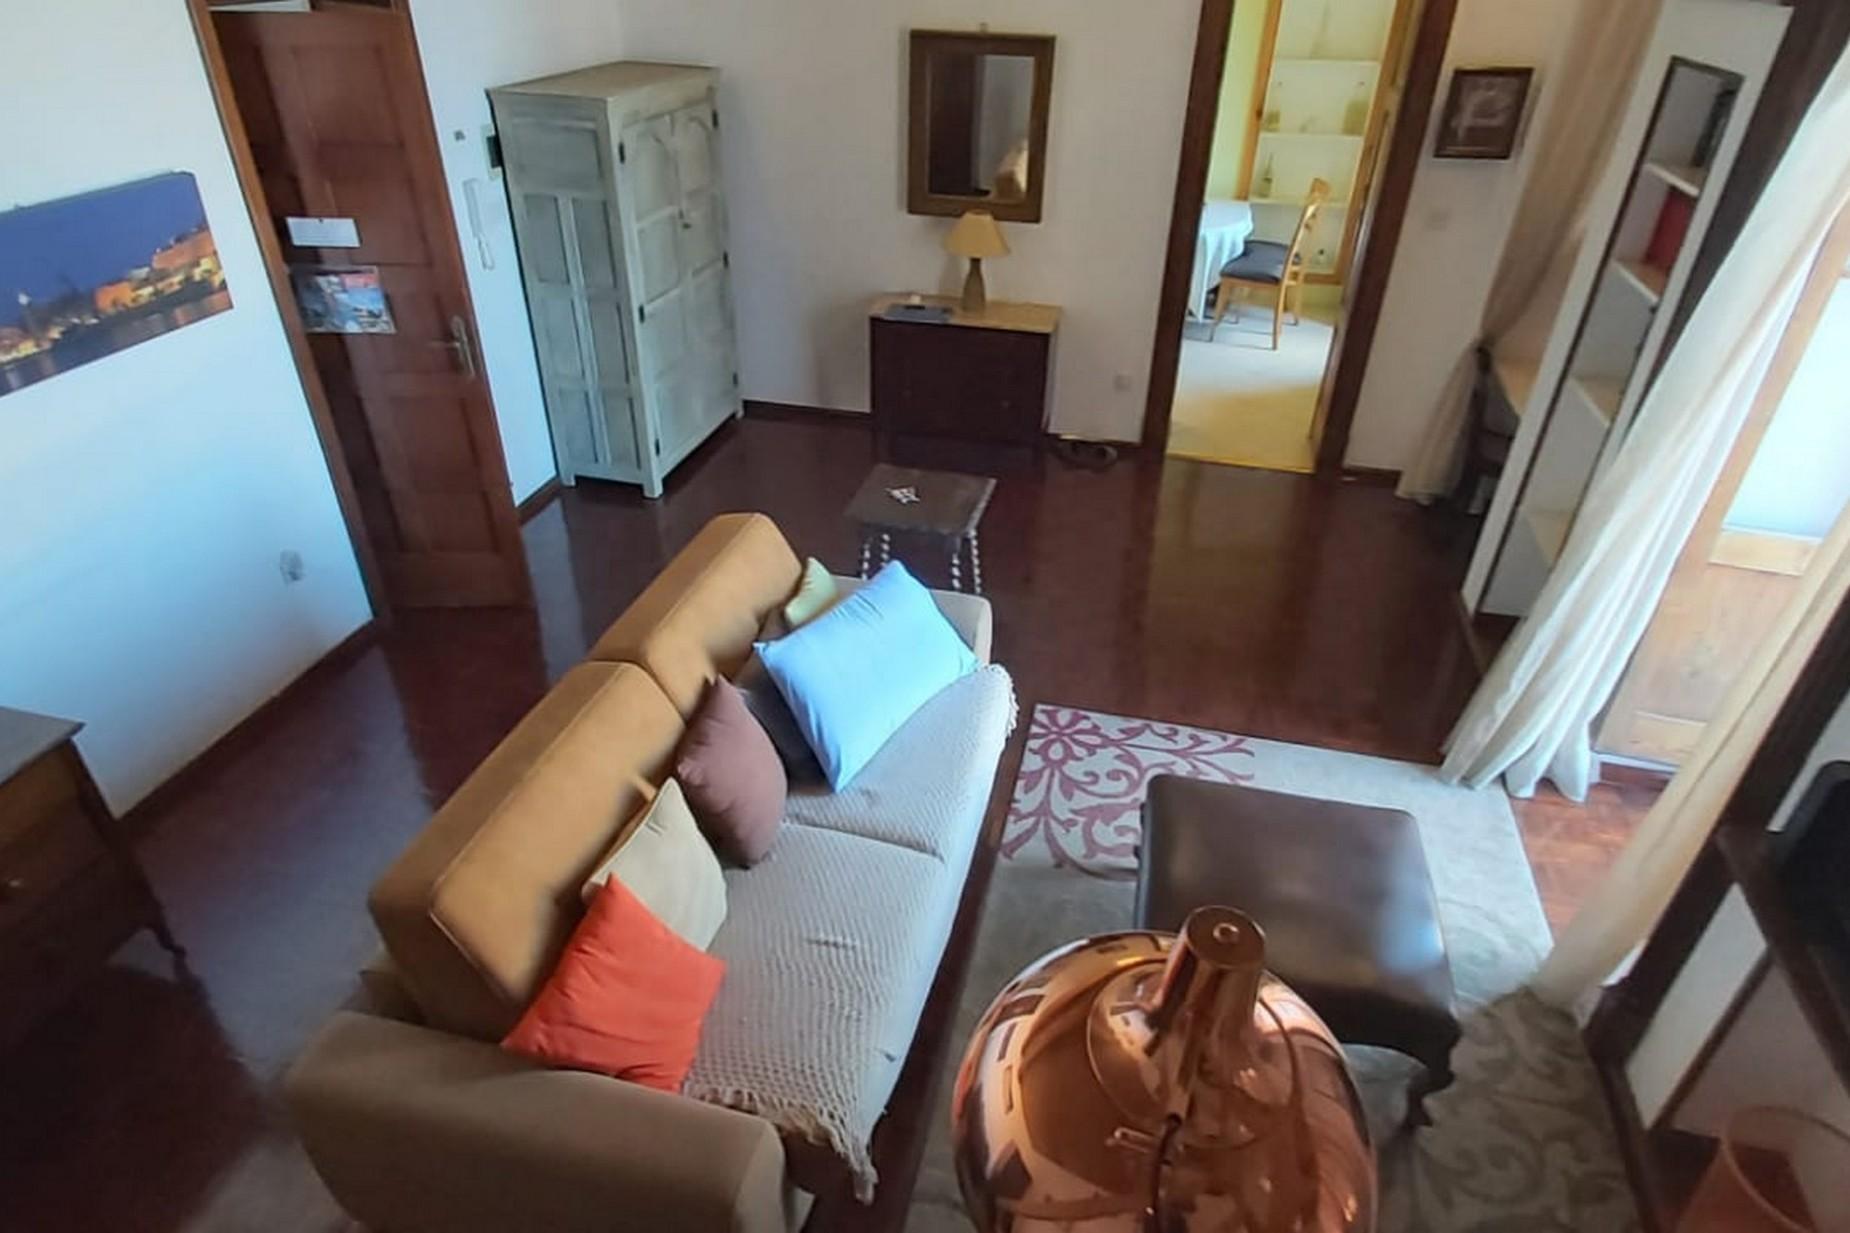 4 bed  For Sale in Valletta, Valletta - thumb 19